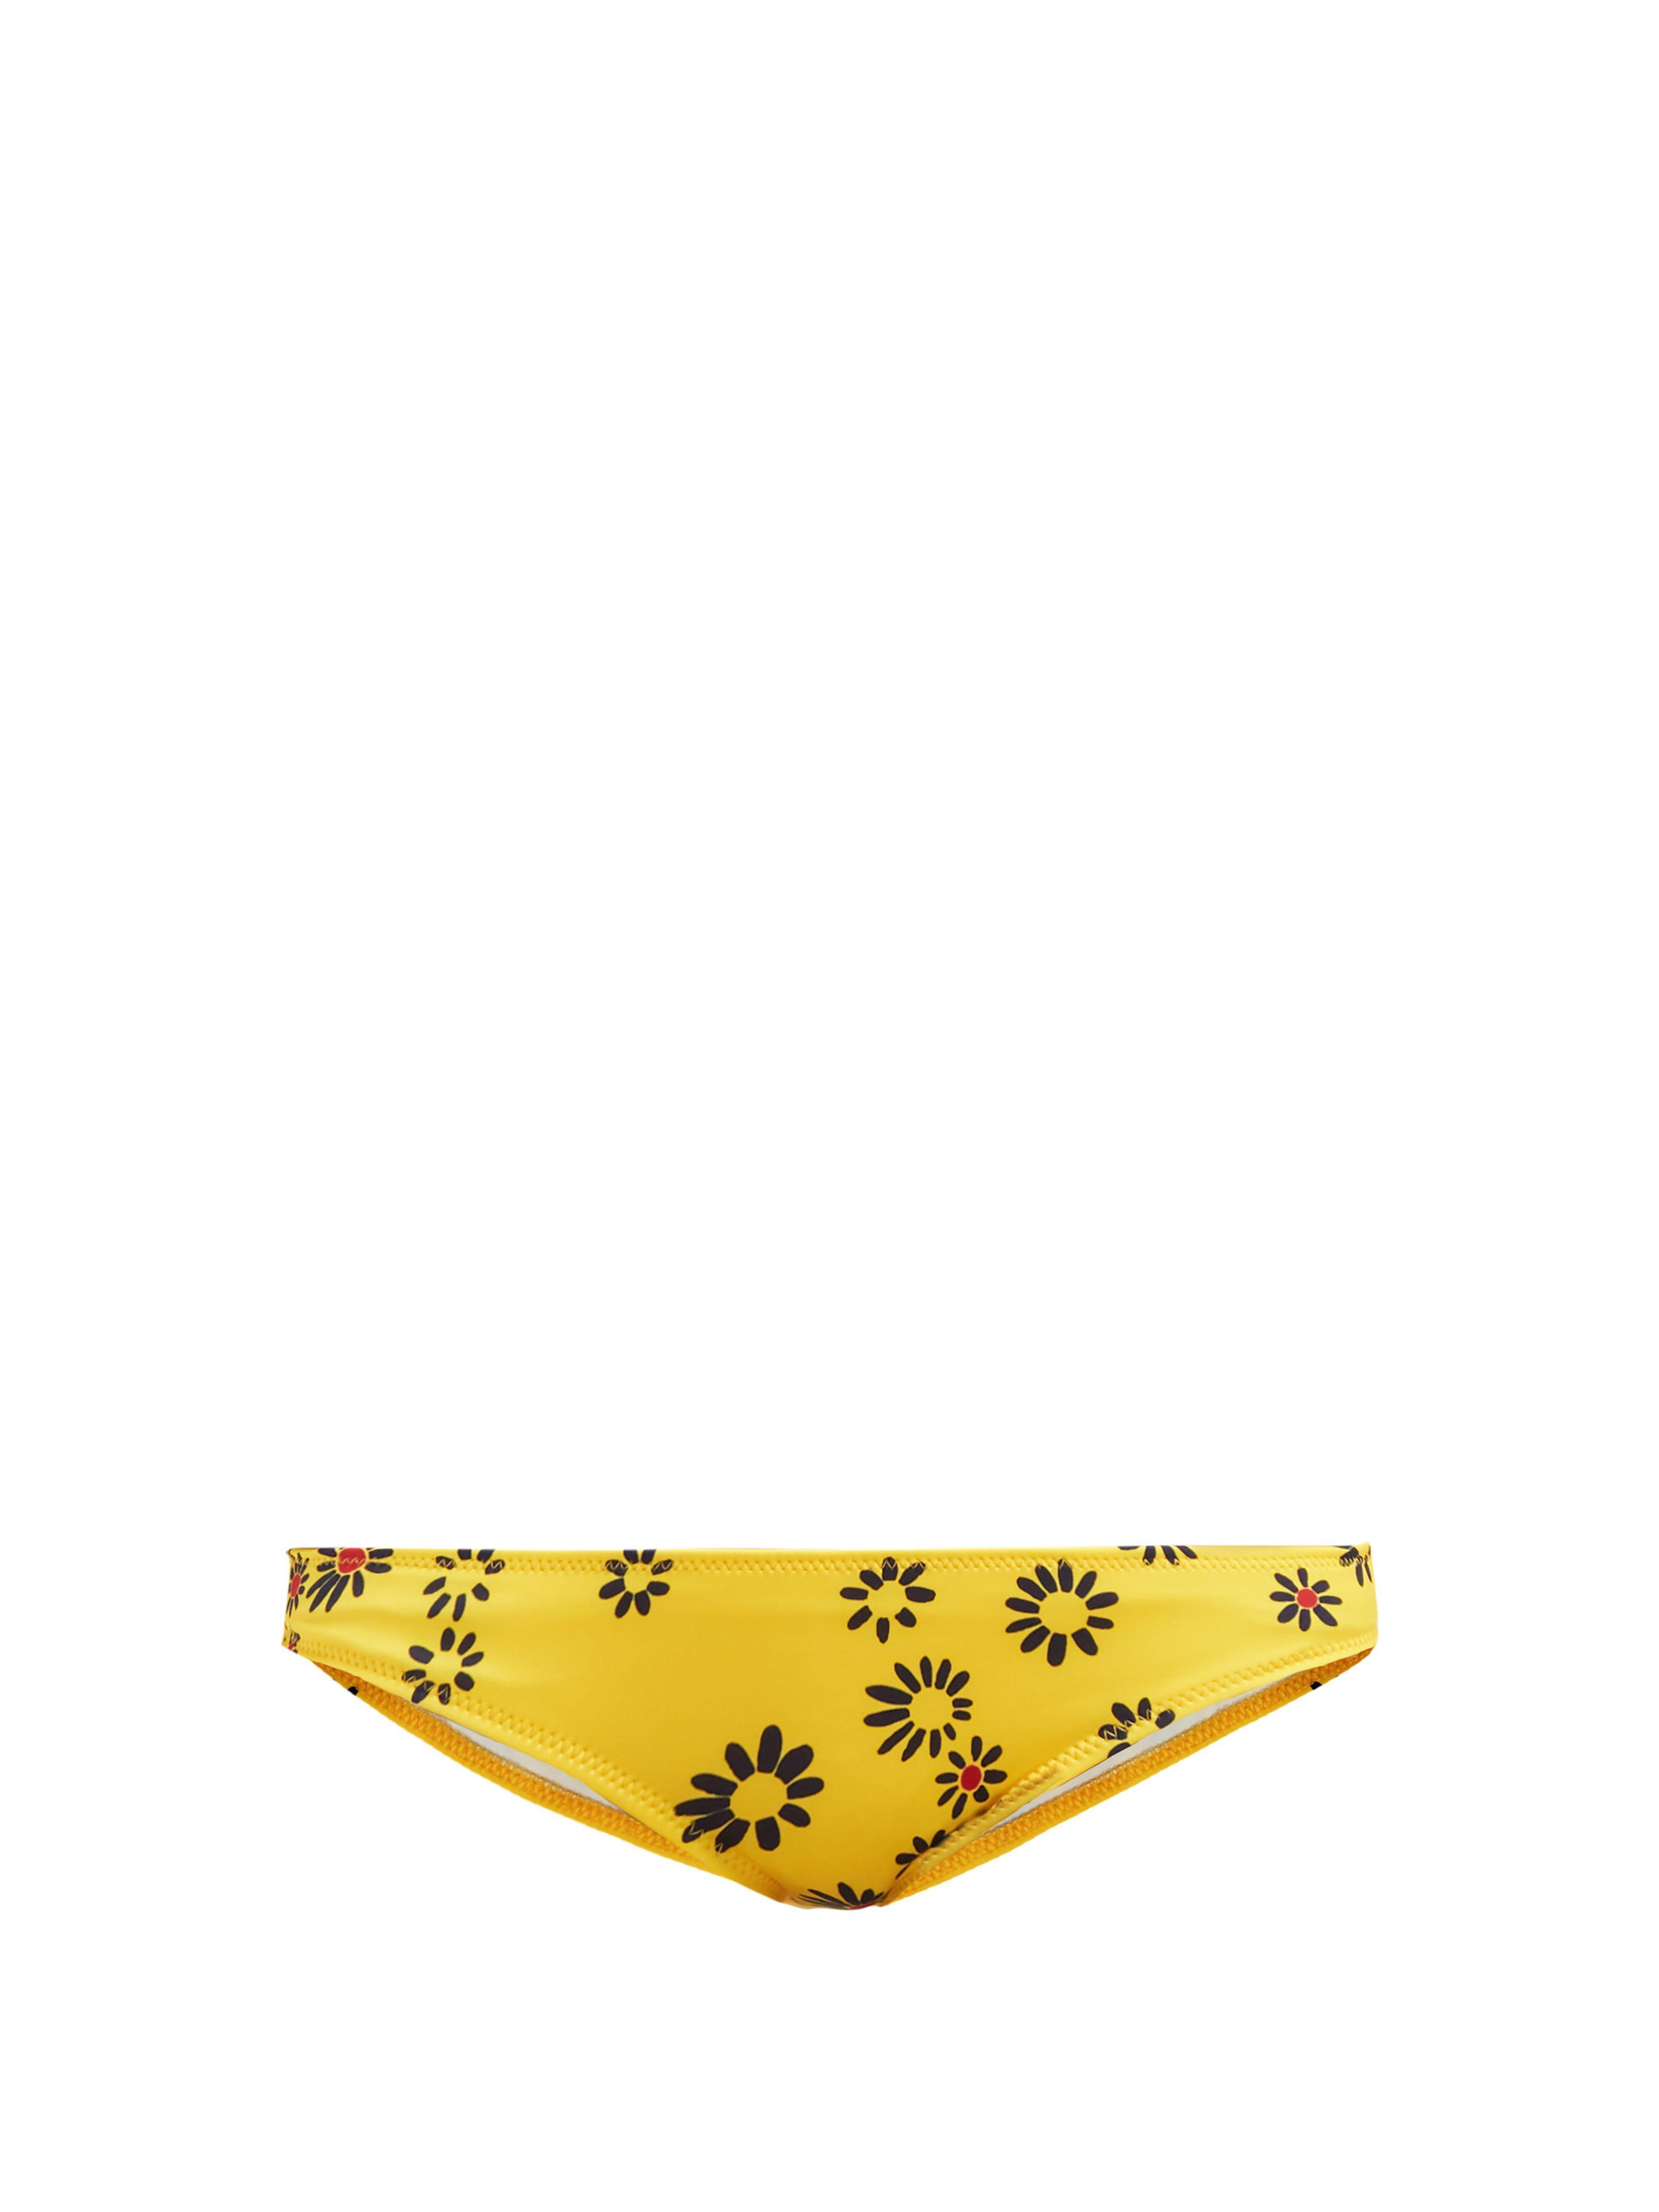 fc3b6a93b7 Solid & Striped The Elle Daisy Print Bikini Briefs in Yellow - Lyst